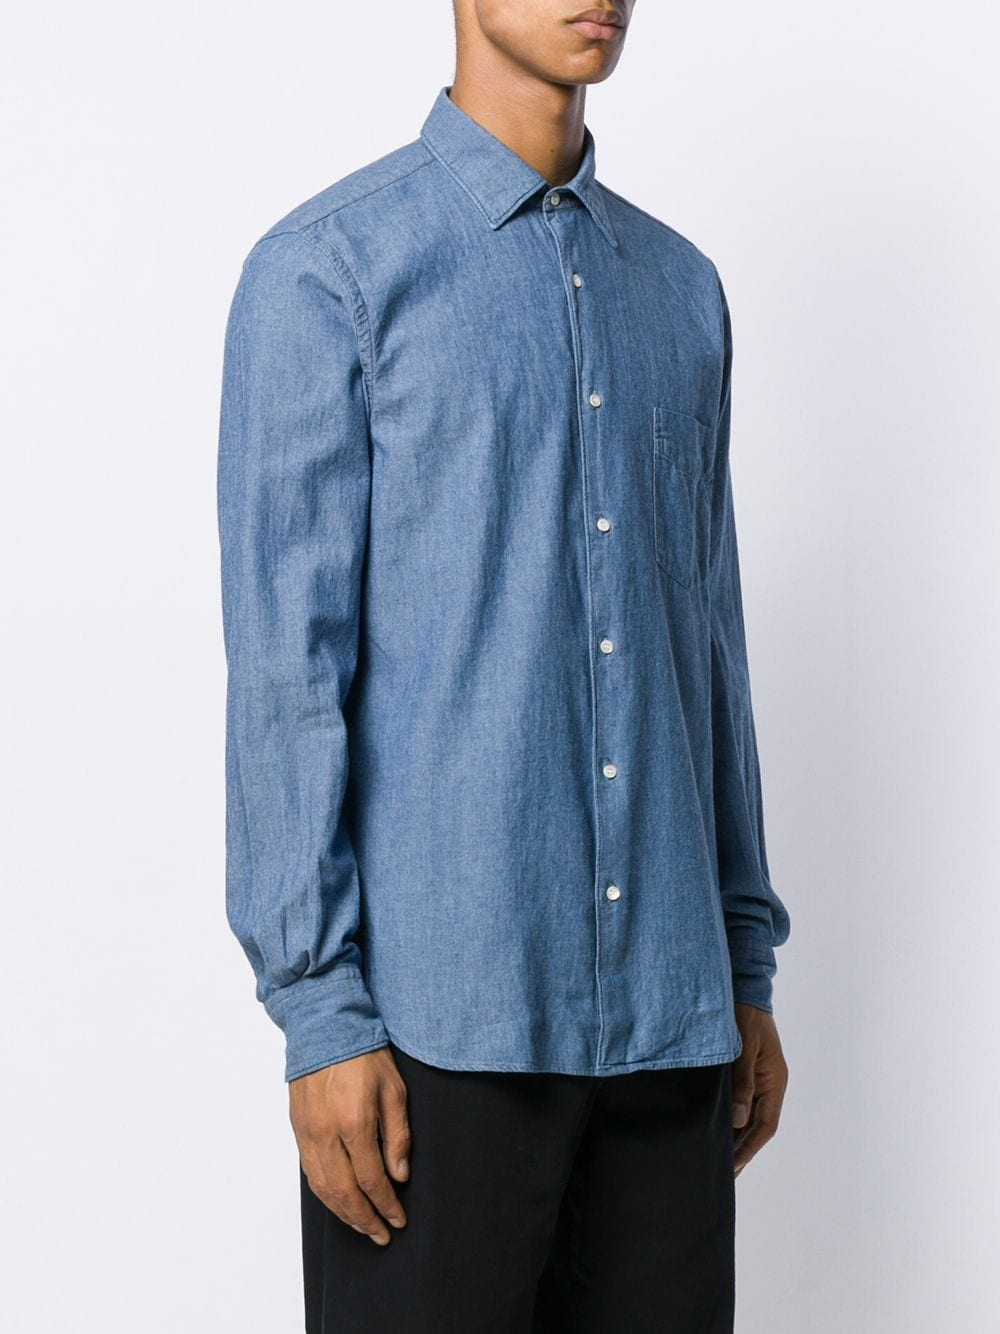 Blue jeans cotton plain long-sleeved shirt  ASPESI |  | CE36-E54201031